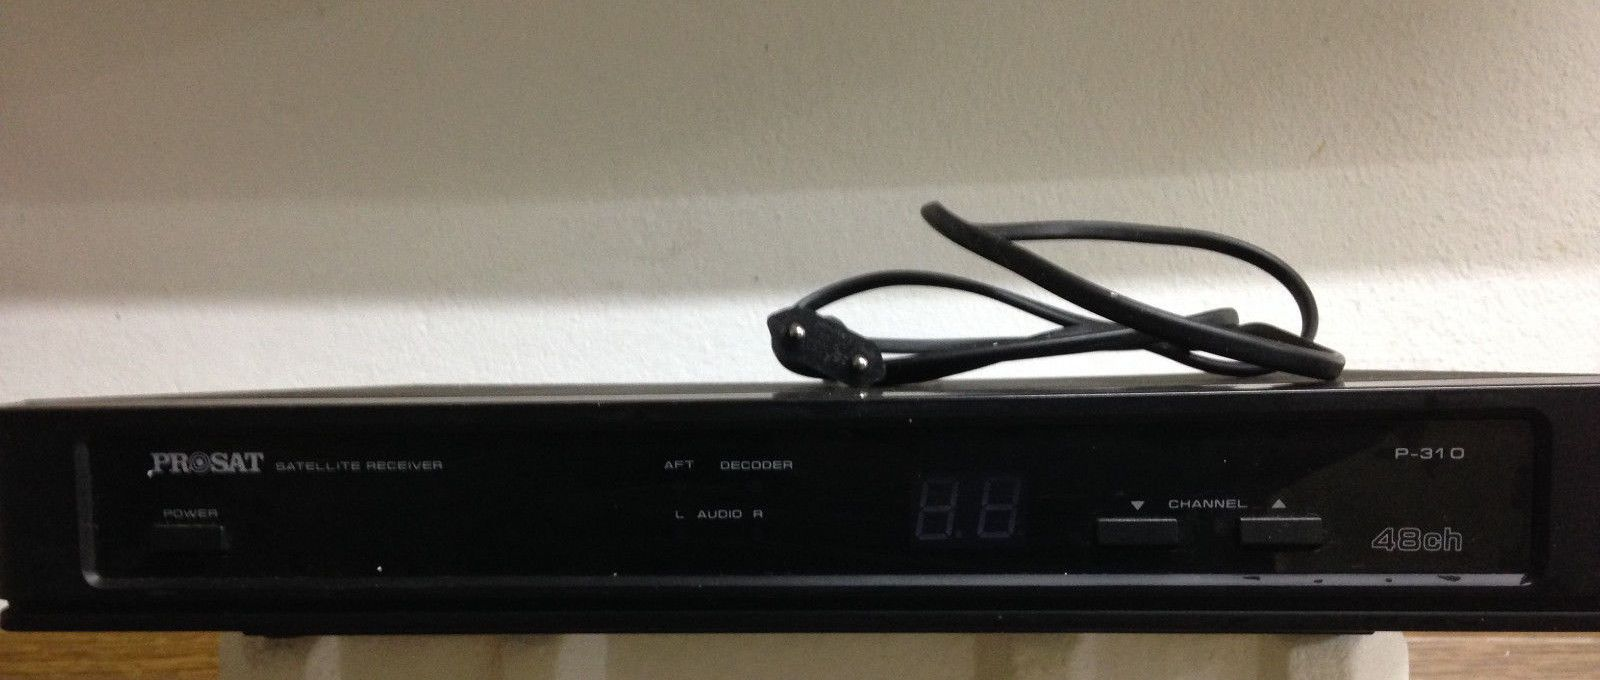 Pro sat Sat Receiver P310 | analogue satellite receiver 2